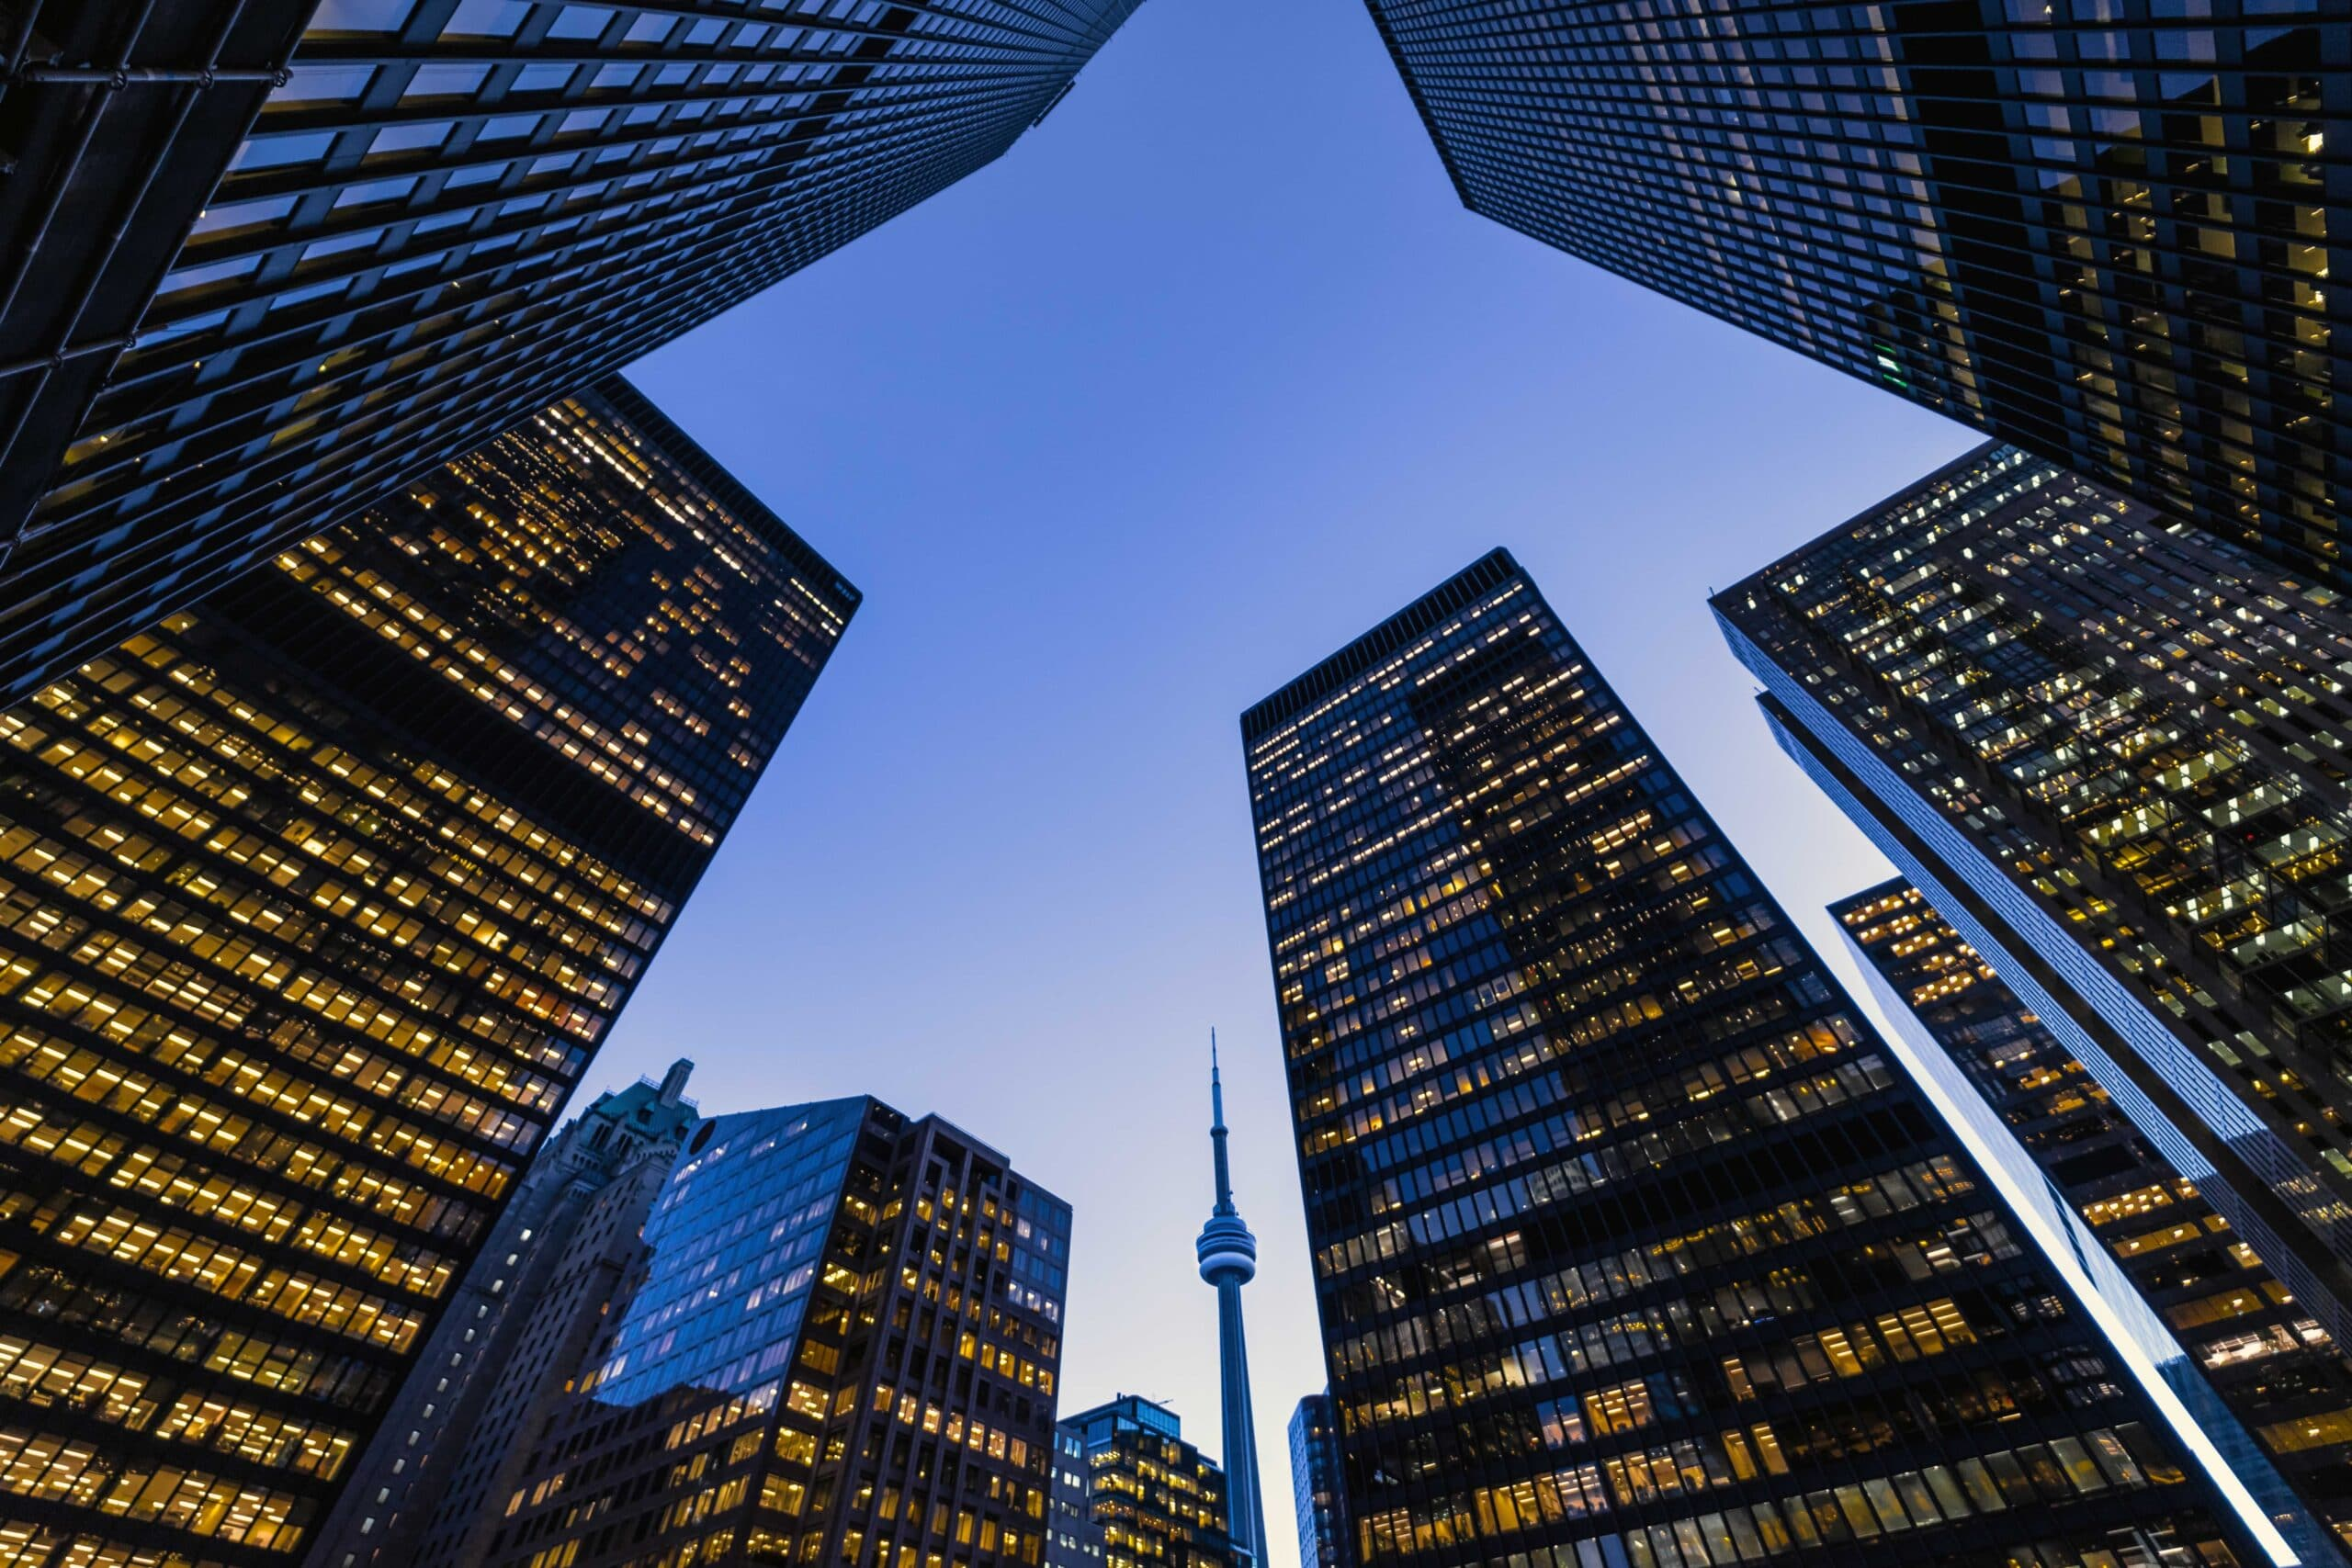 Downtown Toronto financial district skyline